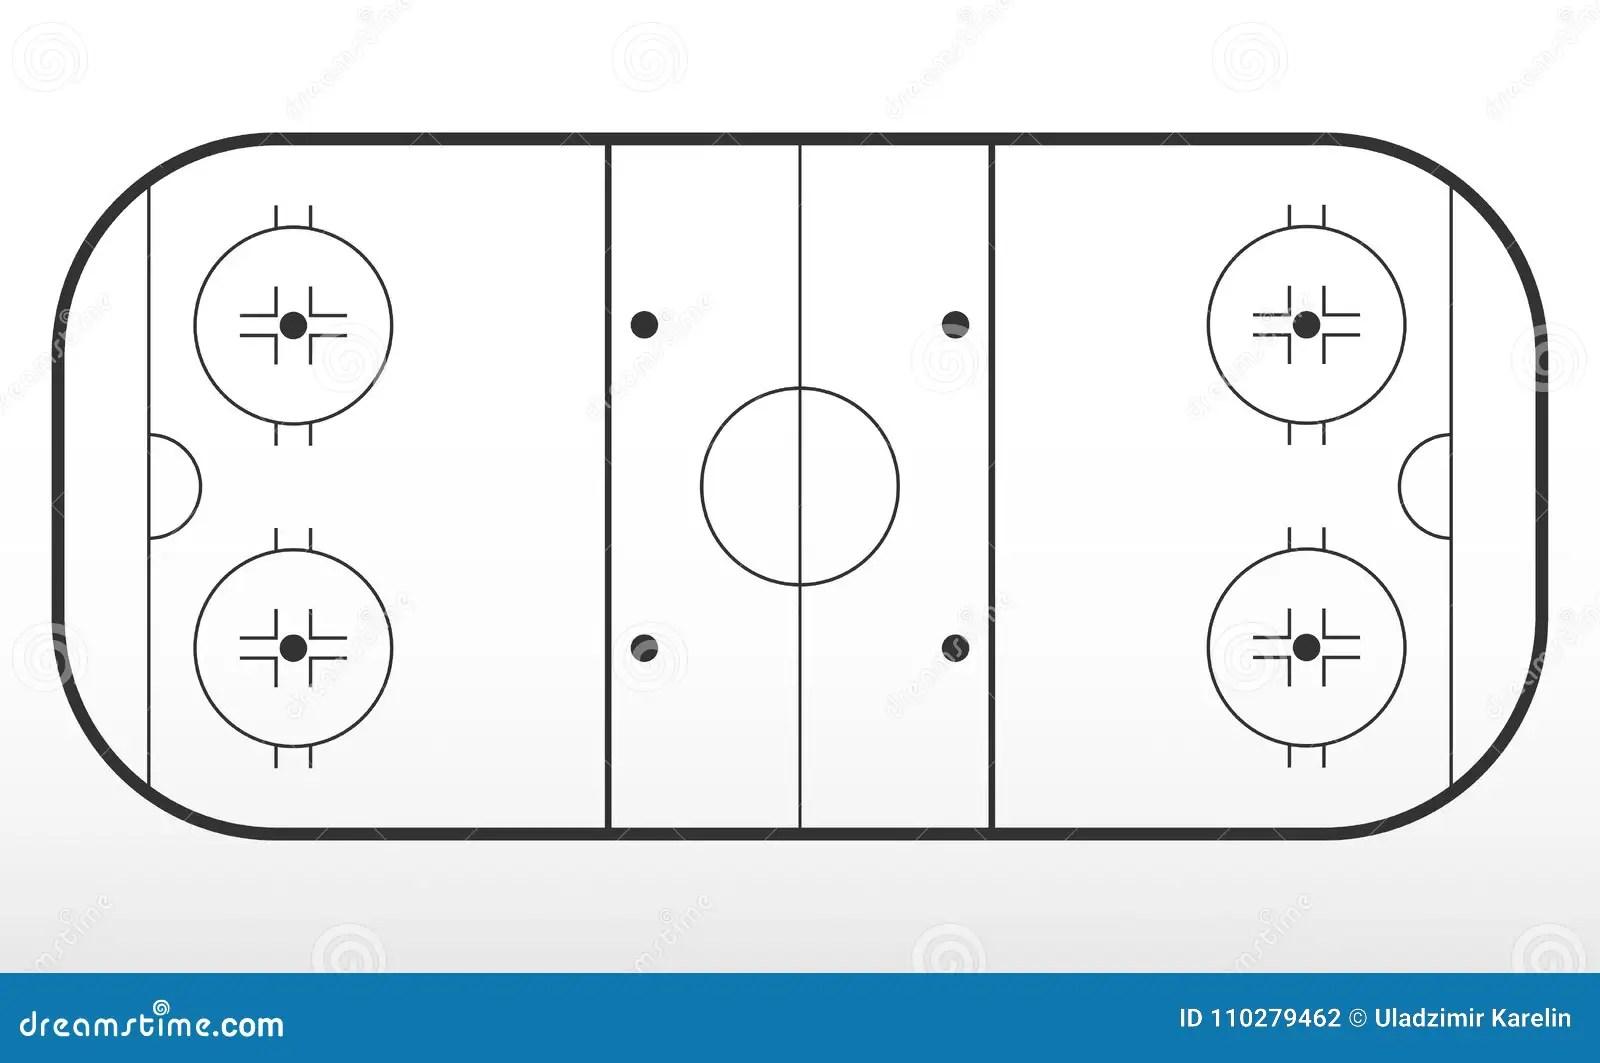 hight resolution of rink ice stock illustrations 7 151 rink ice stock illustrations vectors clipart dreamstime